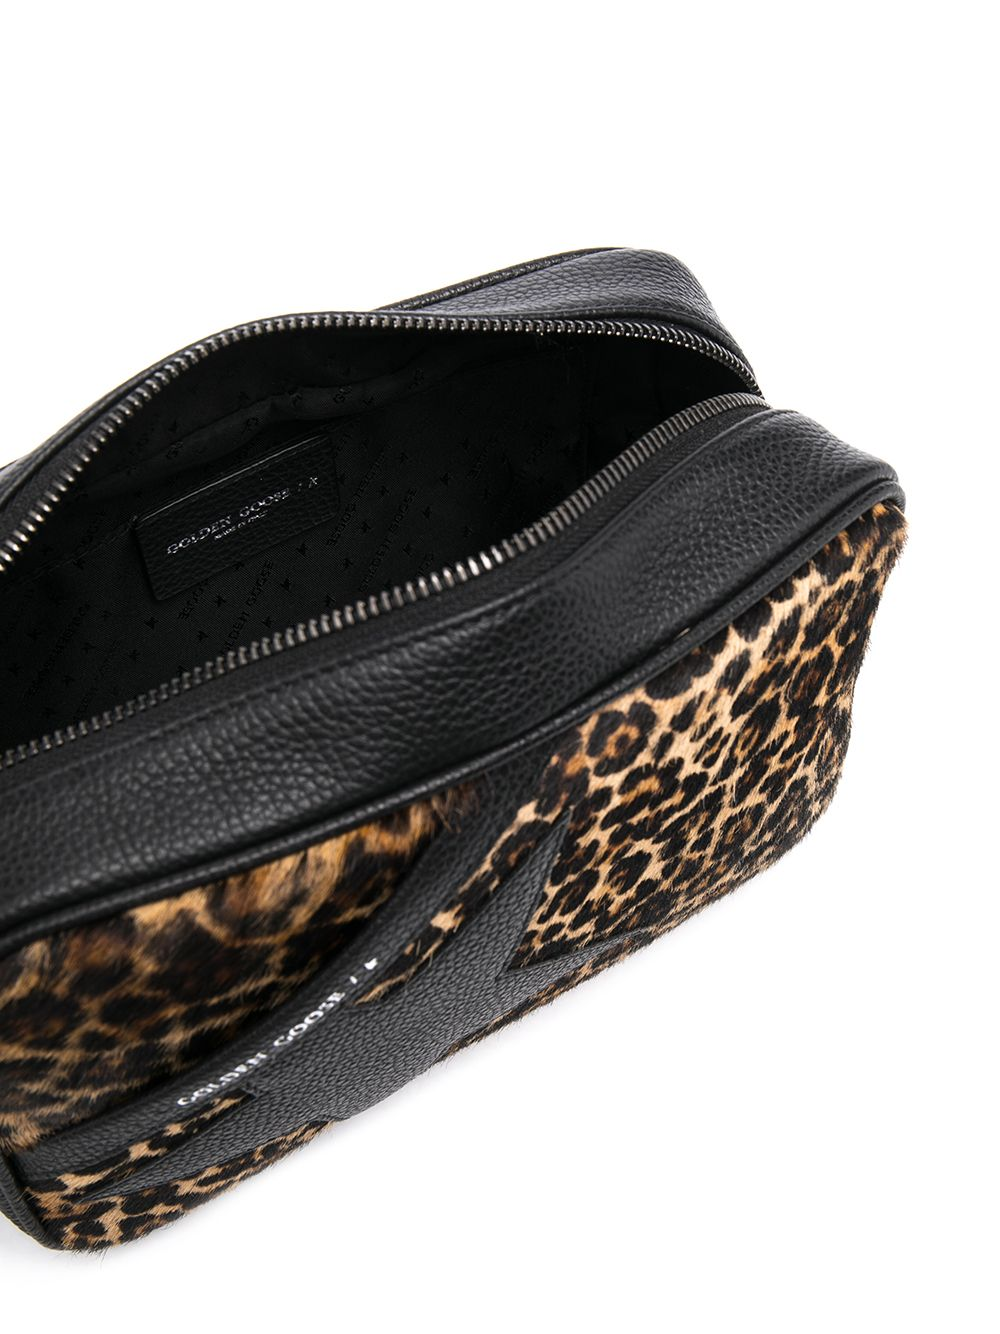 Picture of Golden Goose Deluxe Brand | Leopard Star Cross-Body Bag